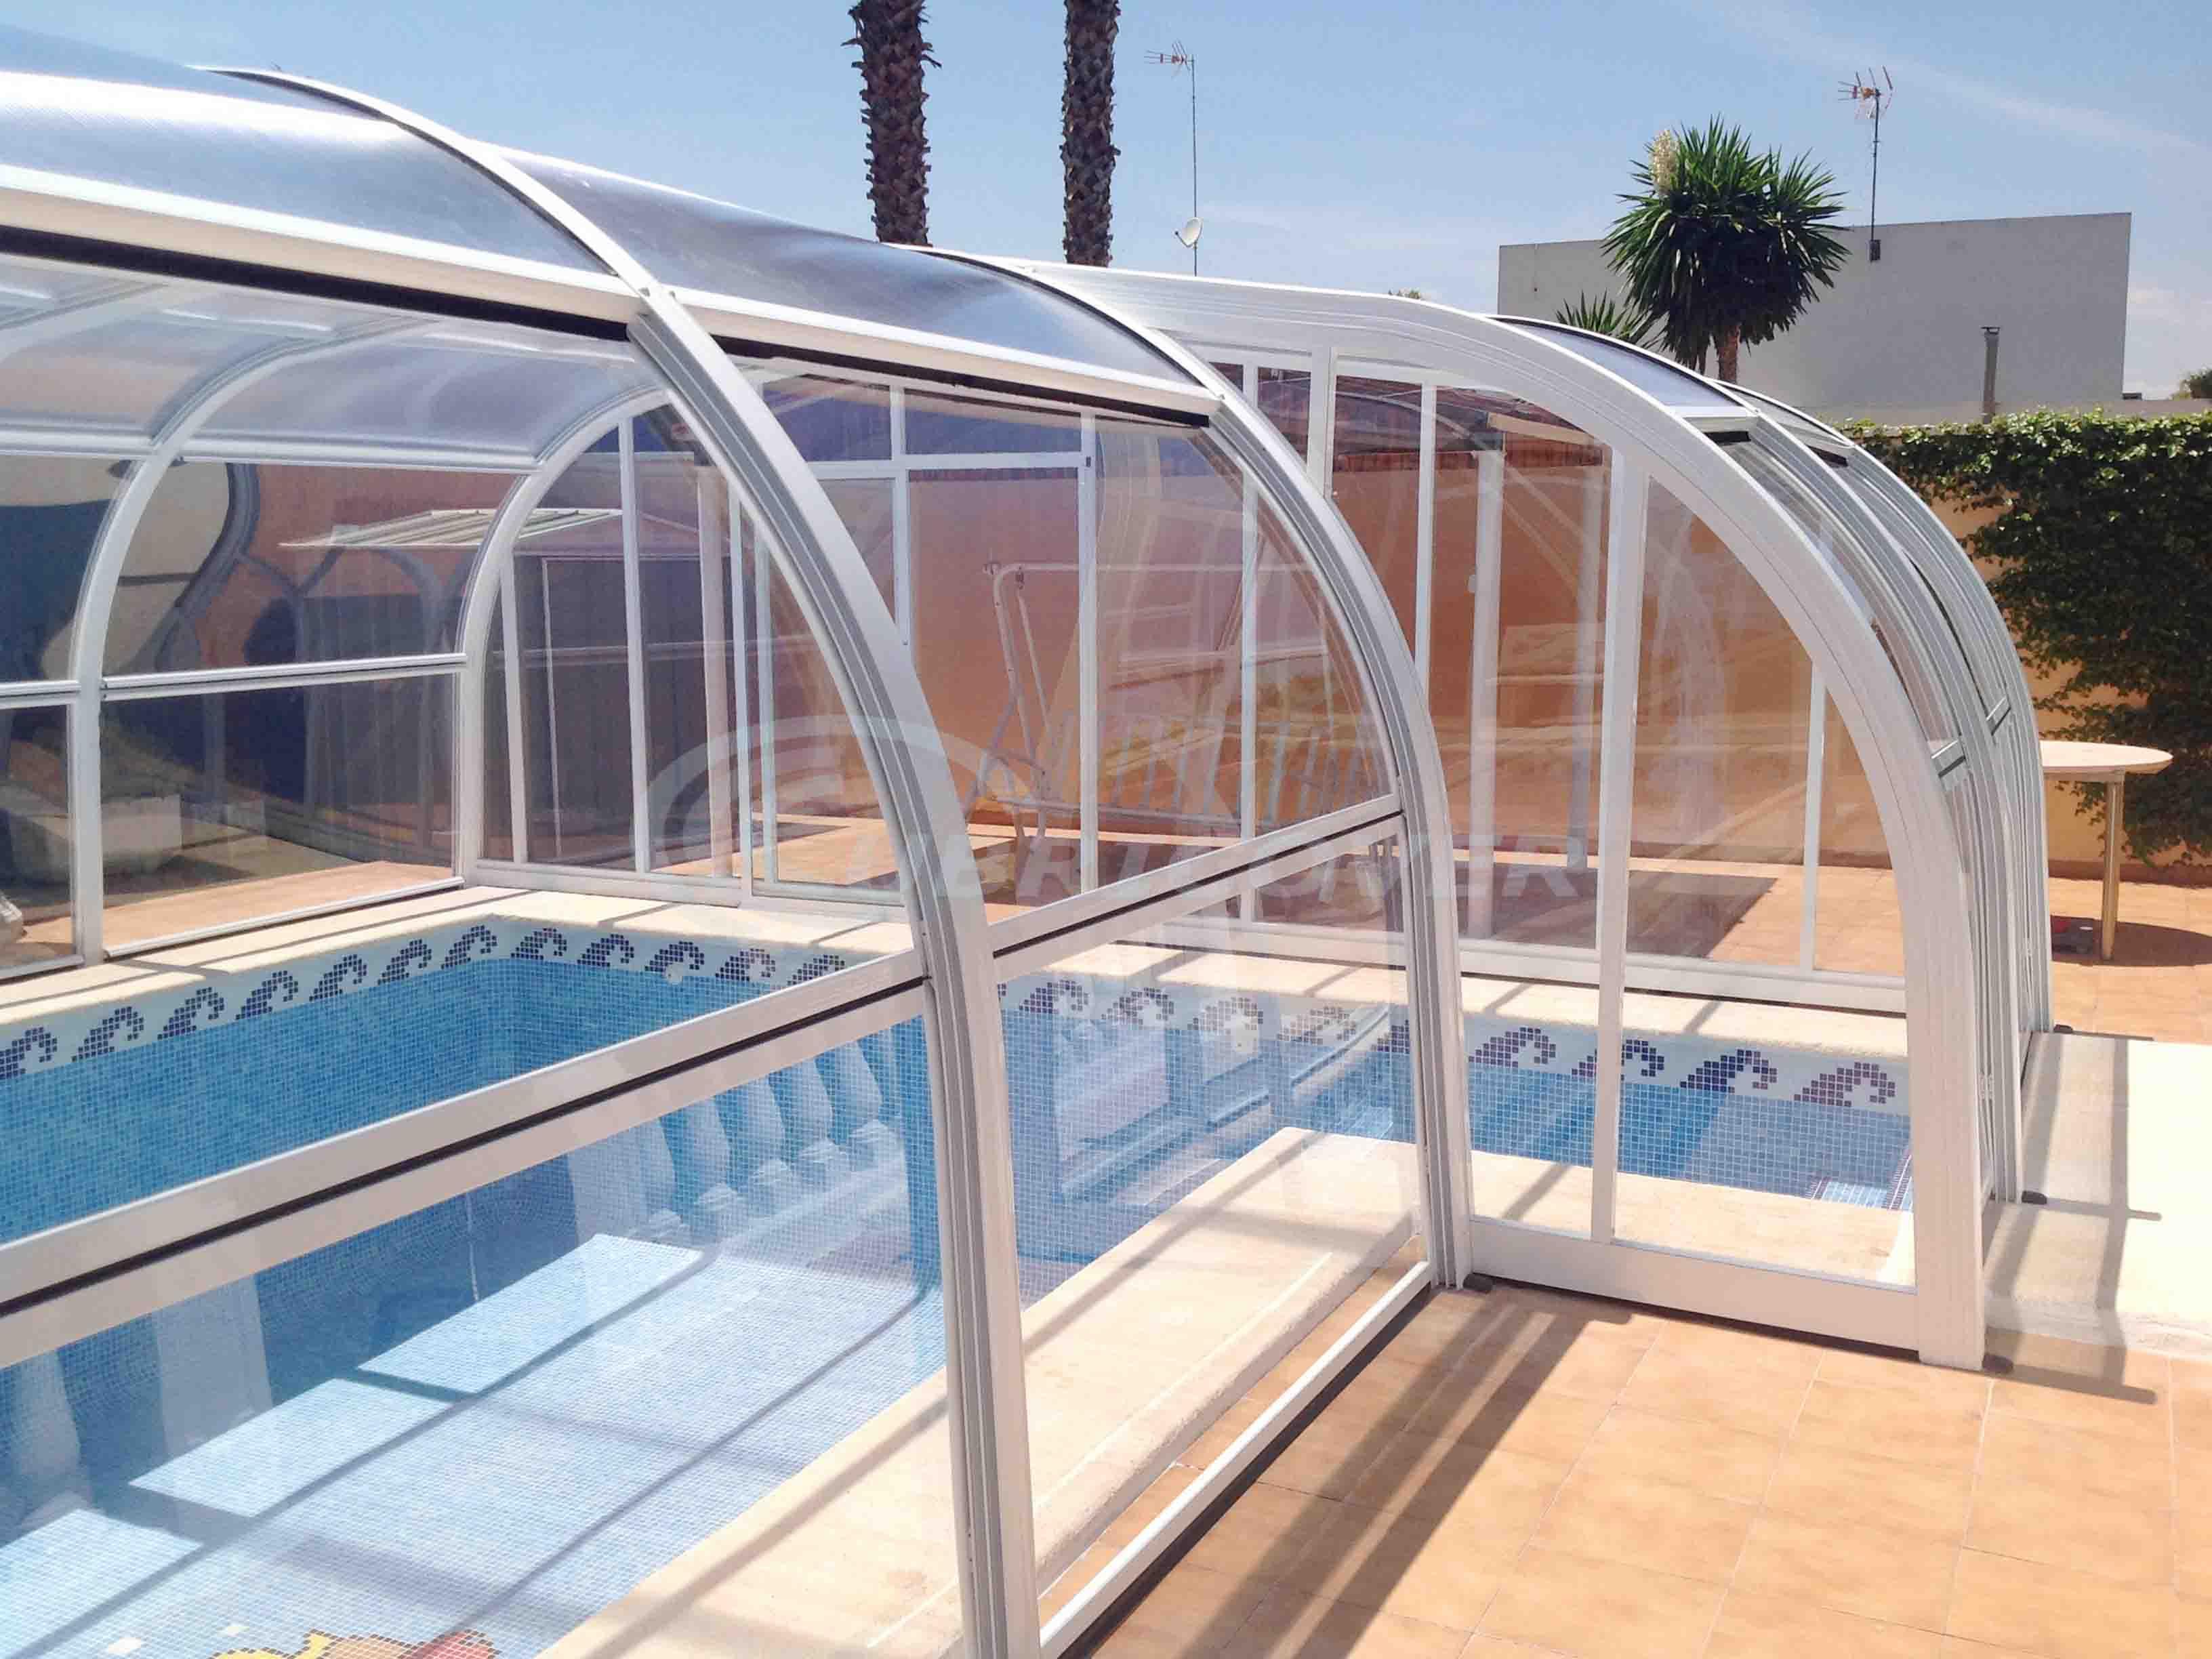 Cubiertas para piscinas fijas cubricover - Piscinas cubiertas malaga ...